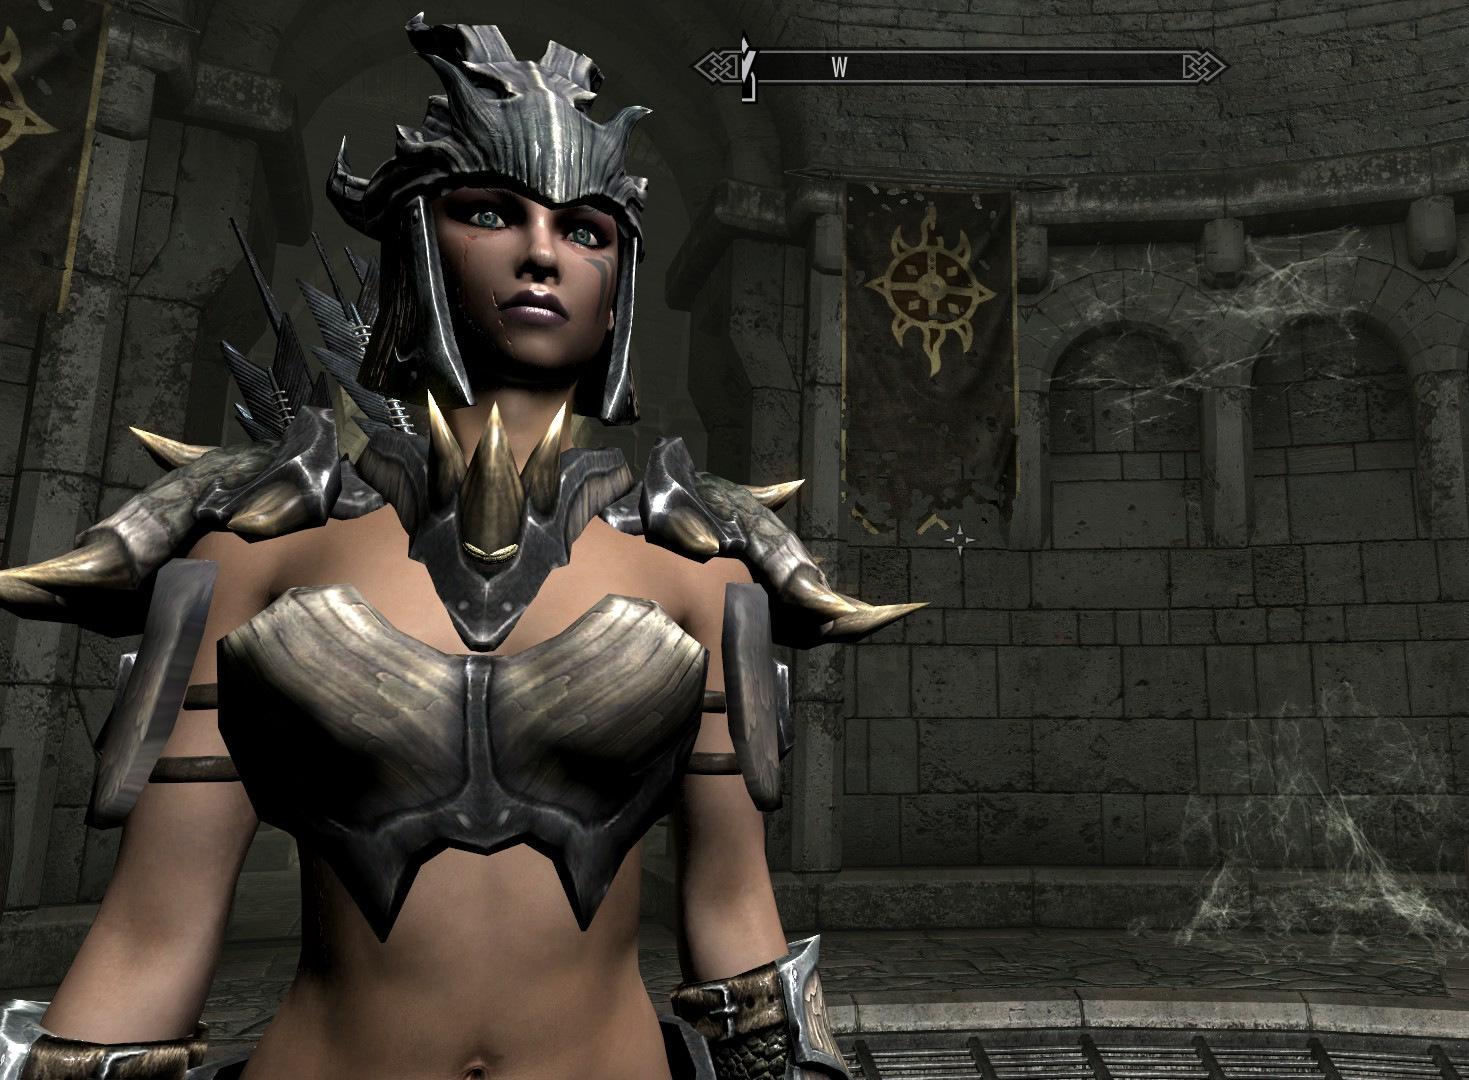 2012-12-23_00007.jpg - Elder Scrolls 5: Skyrim, the